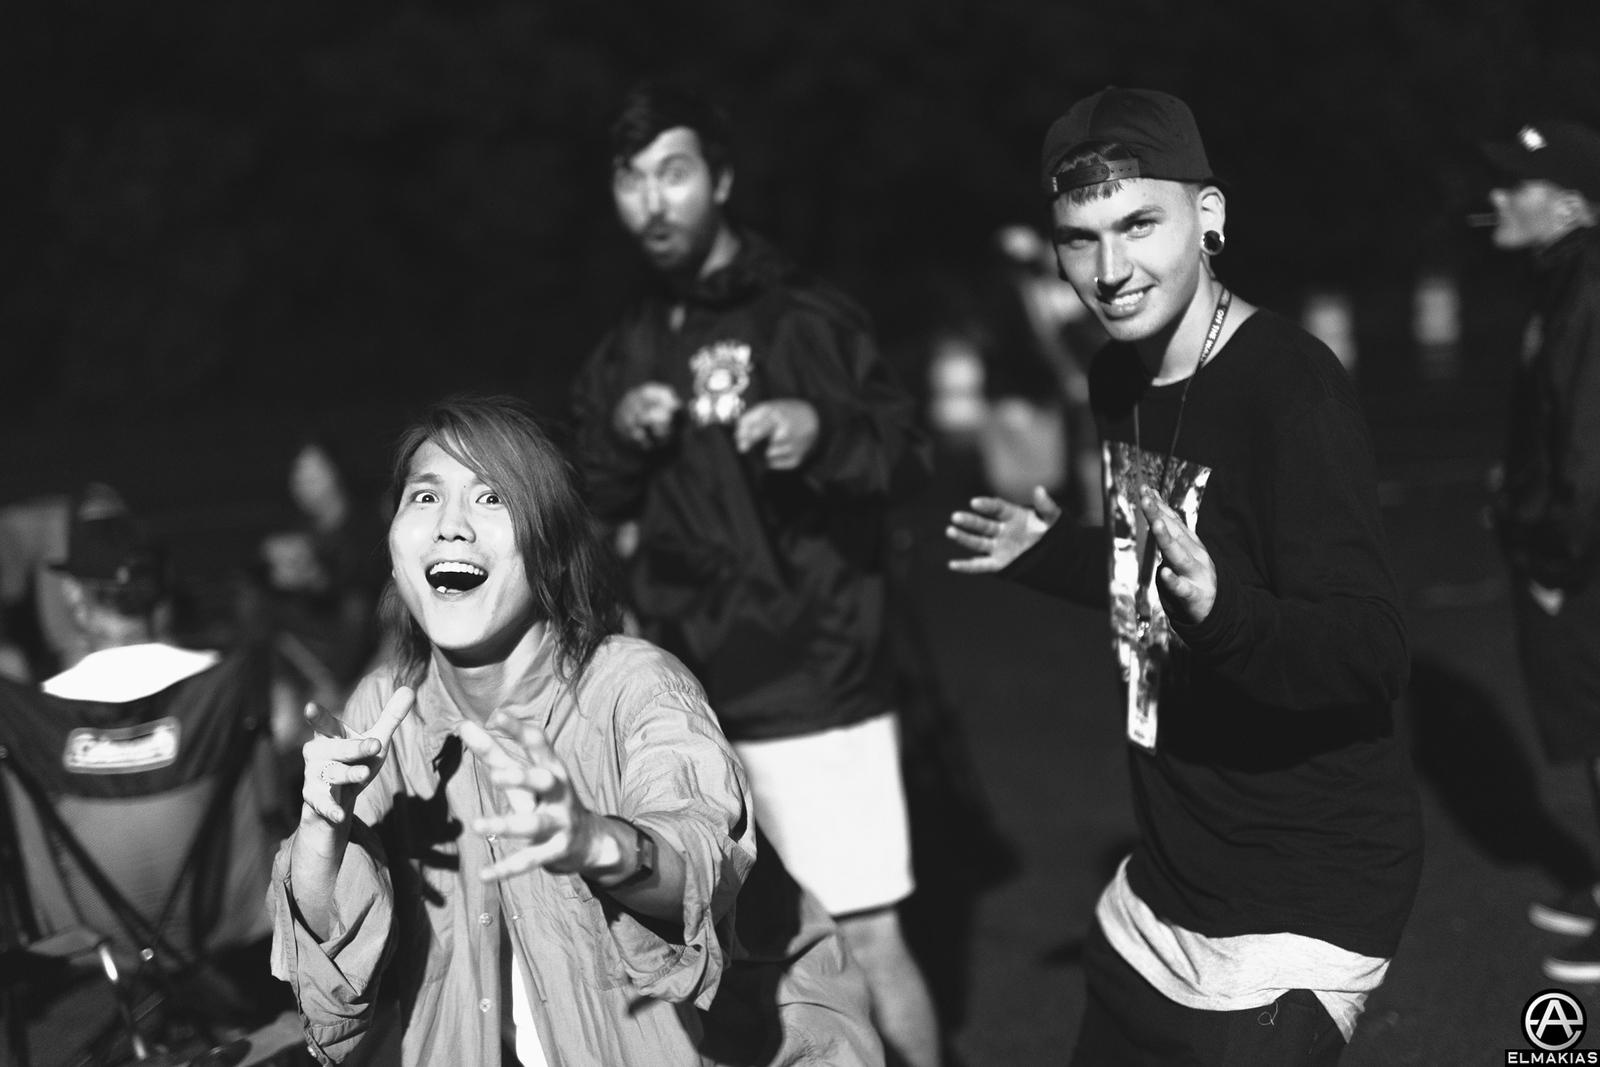 Hiroki Ikegawa of Crossfaith and Kyle Anthony of PVRIS at Vans Warped Tour 2015 by Adam Elmakias